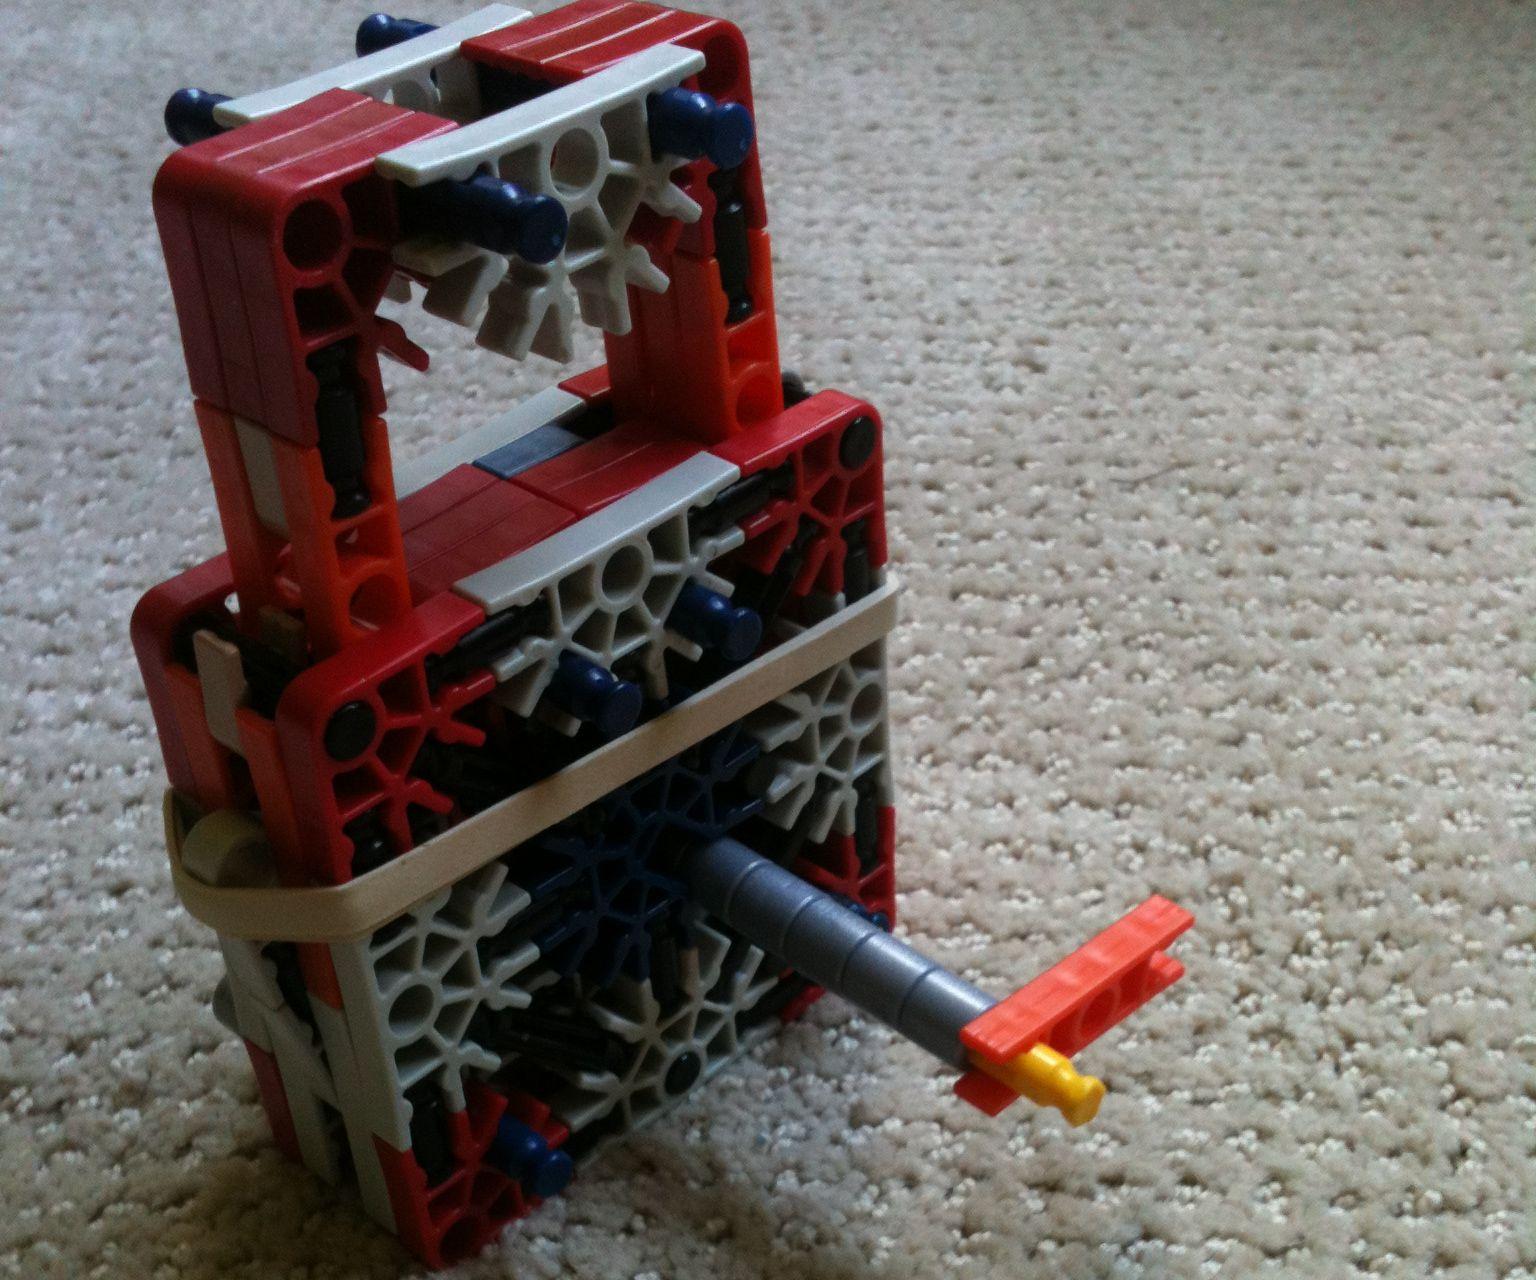 Functioning K'nex Padlock With A Key